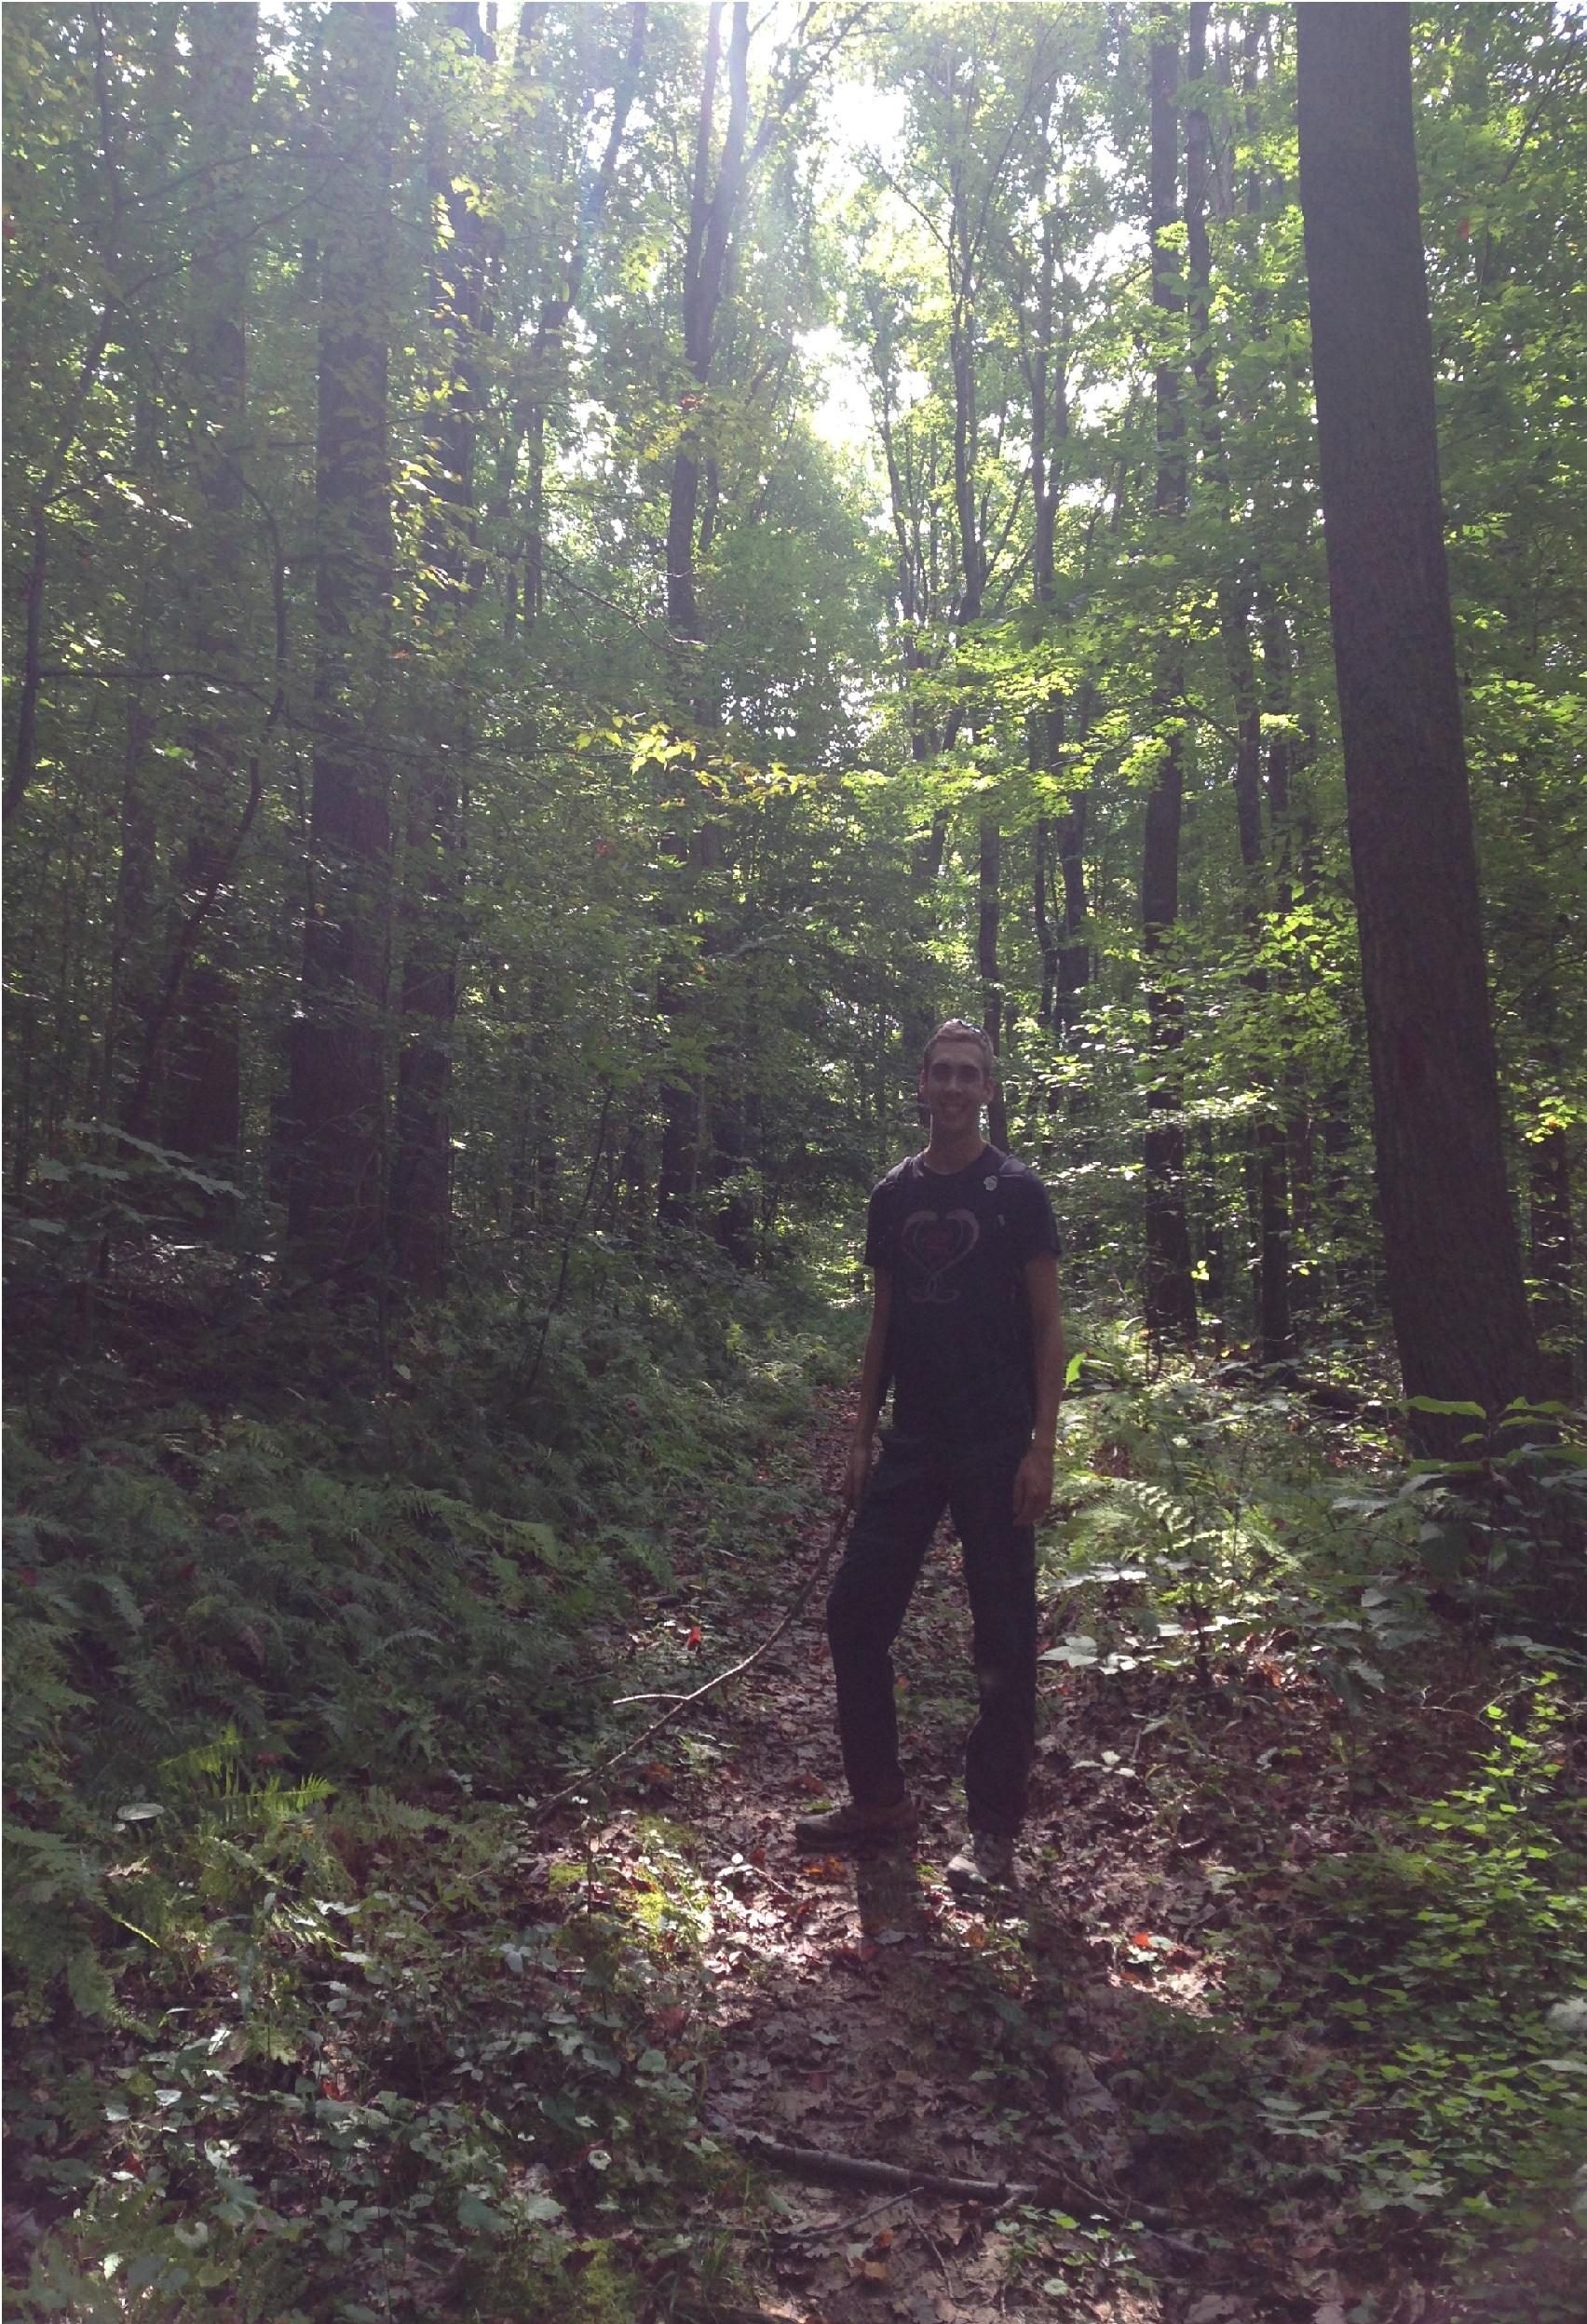 Photo 2014-9-19 下午2 33 12_1.jpg